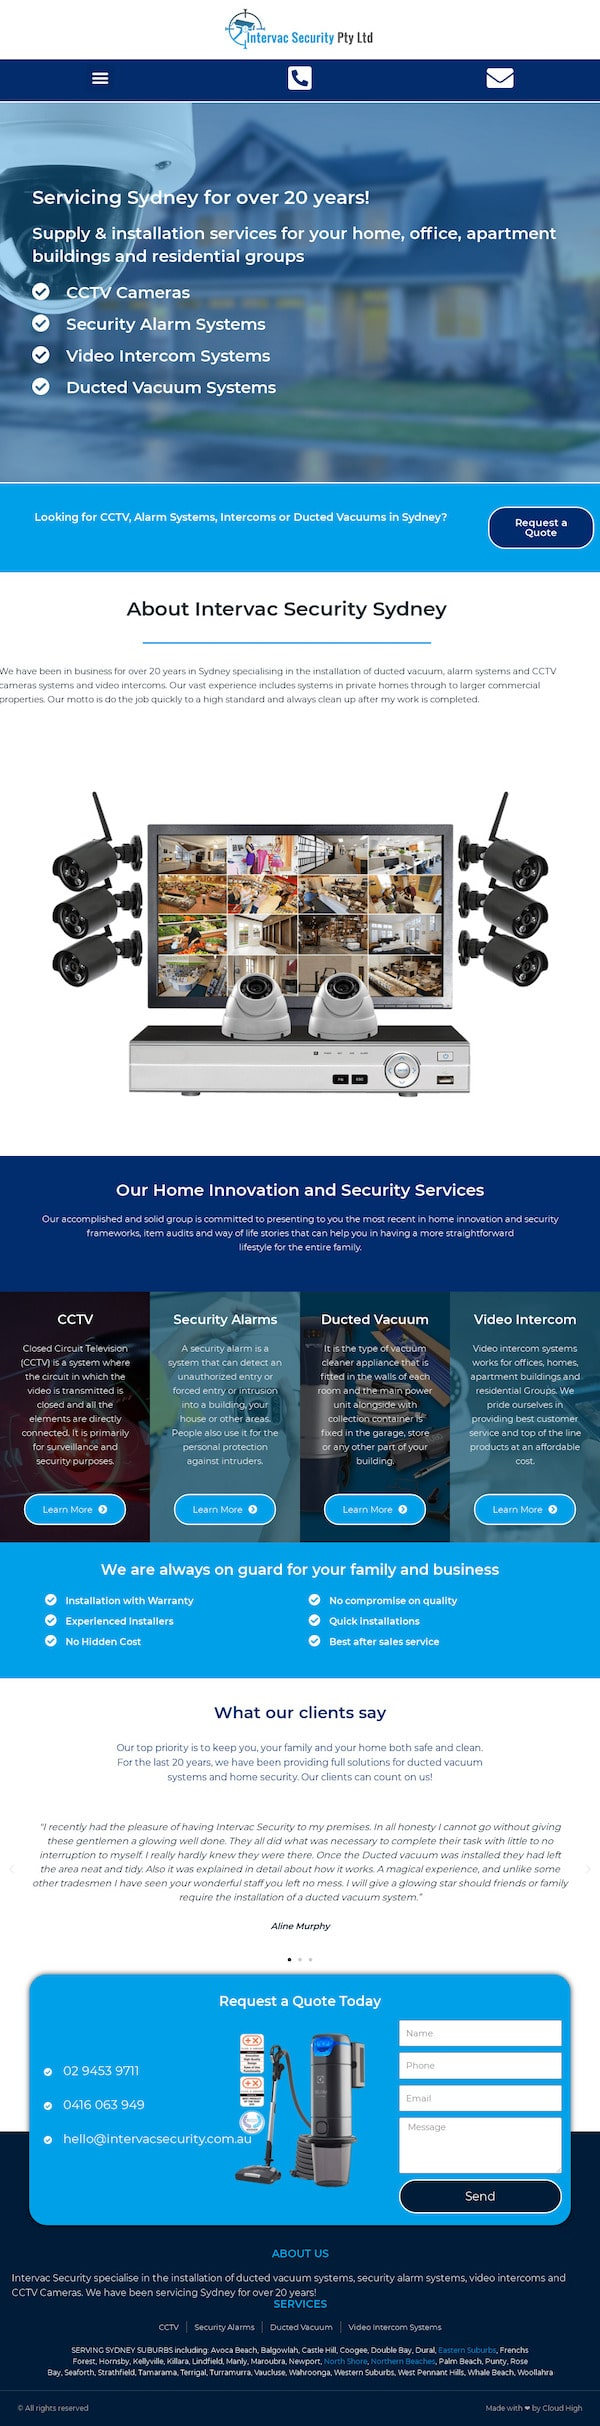 Intervac Security - WordPress Website Design Sydney - Cloud High